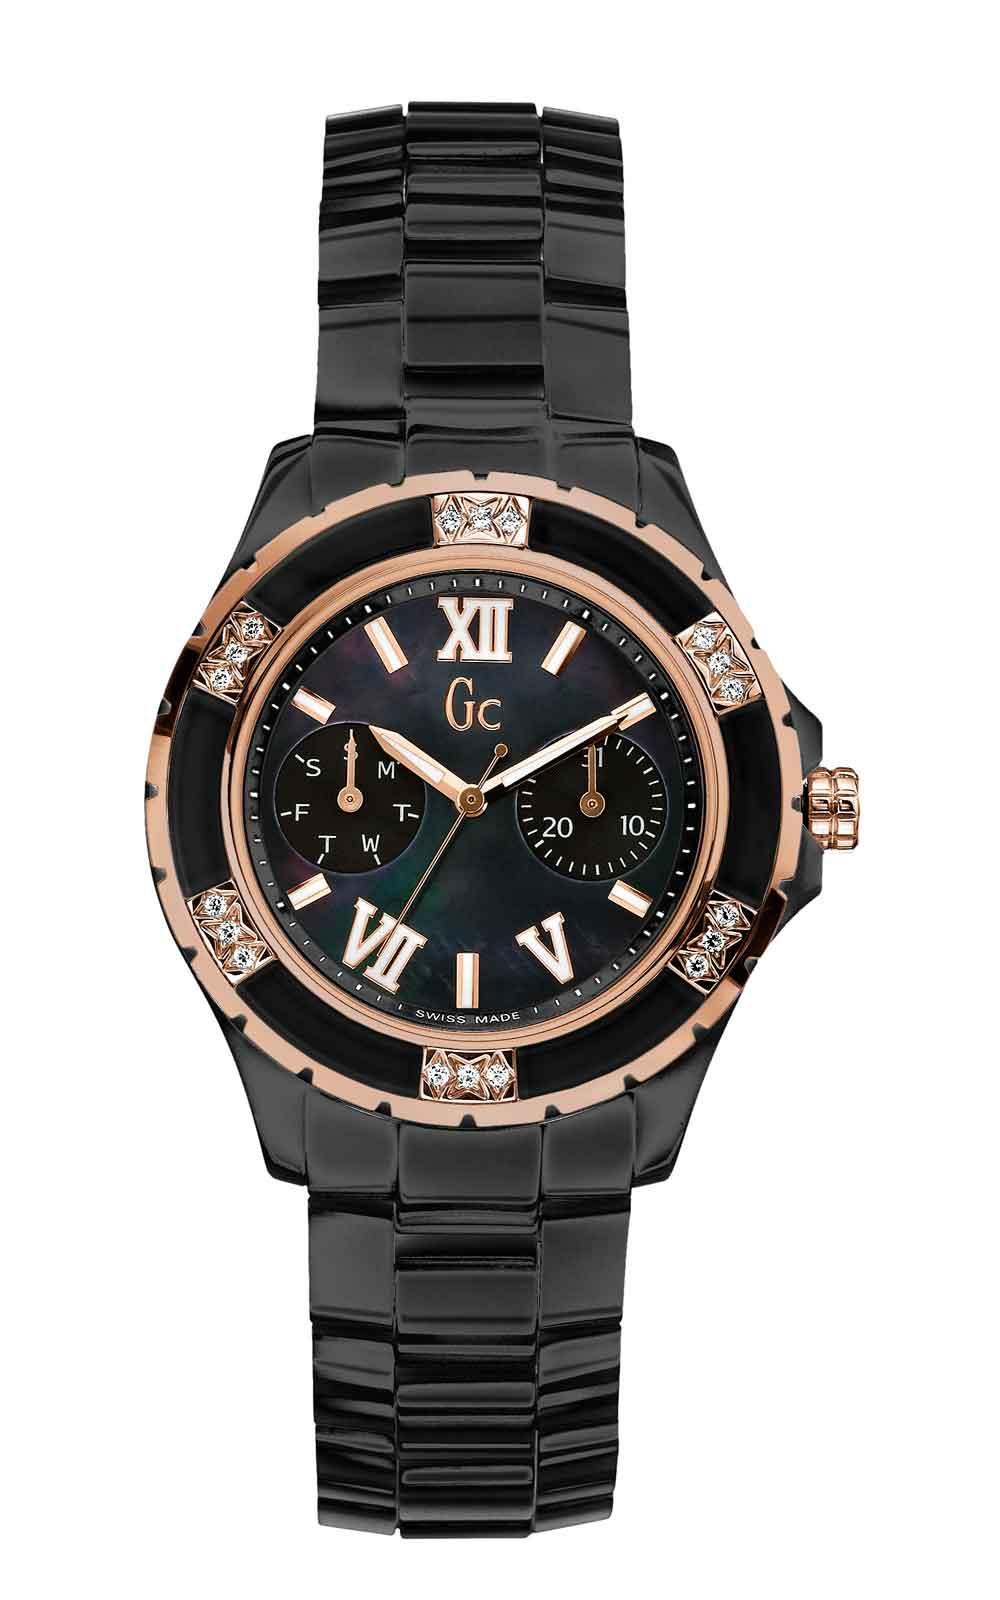 eloj GC Smart Luxury Swiss Movement colección Diamonds